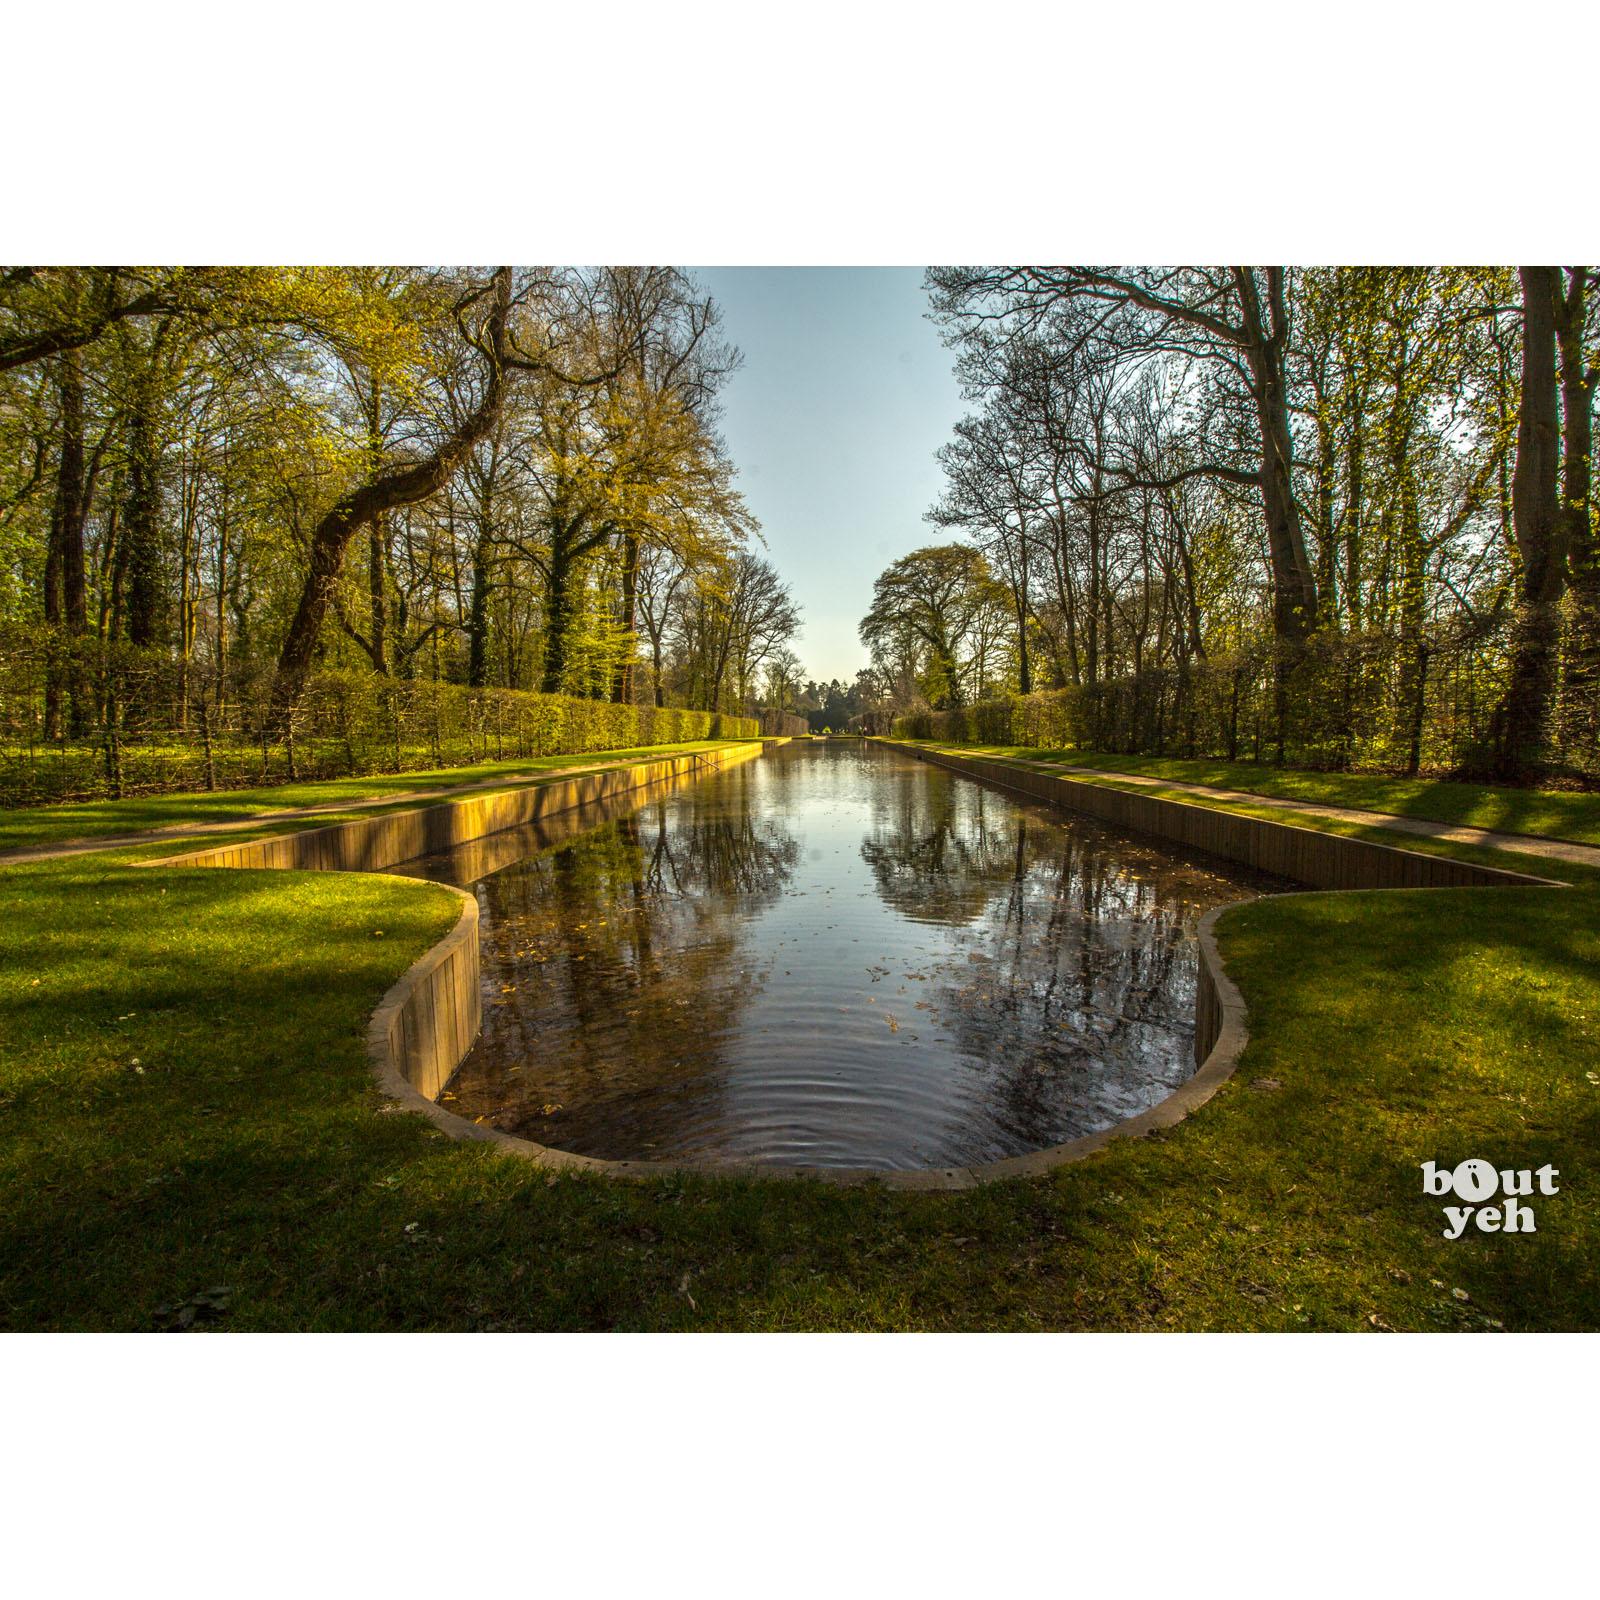 Image - Featured photographer, Justin McLean, photograph of Antrim Castle gardens, Antrim, Northern Ireland.